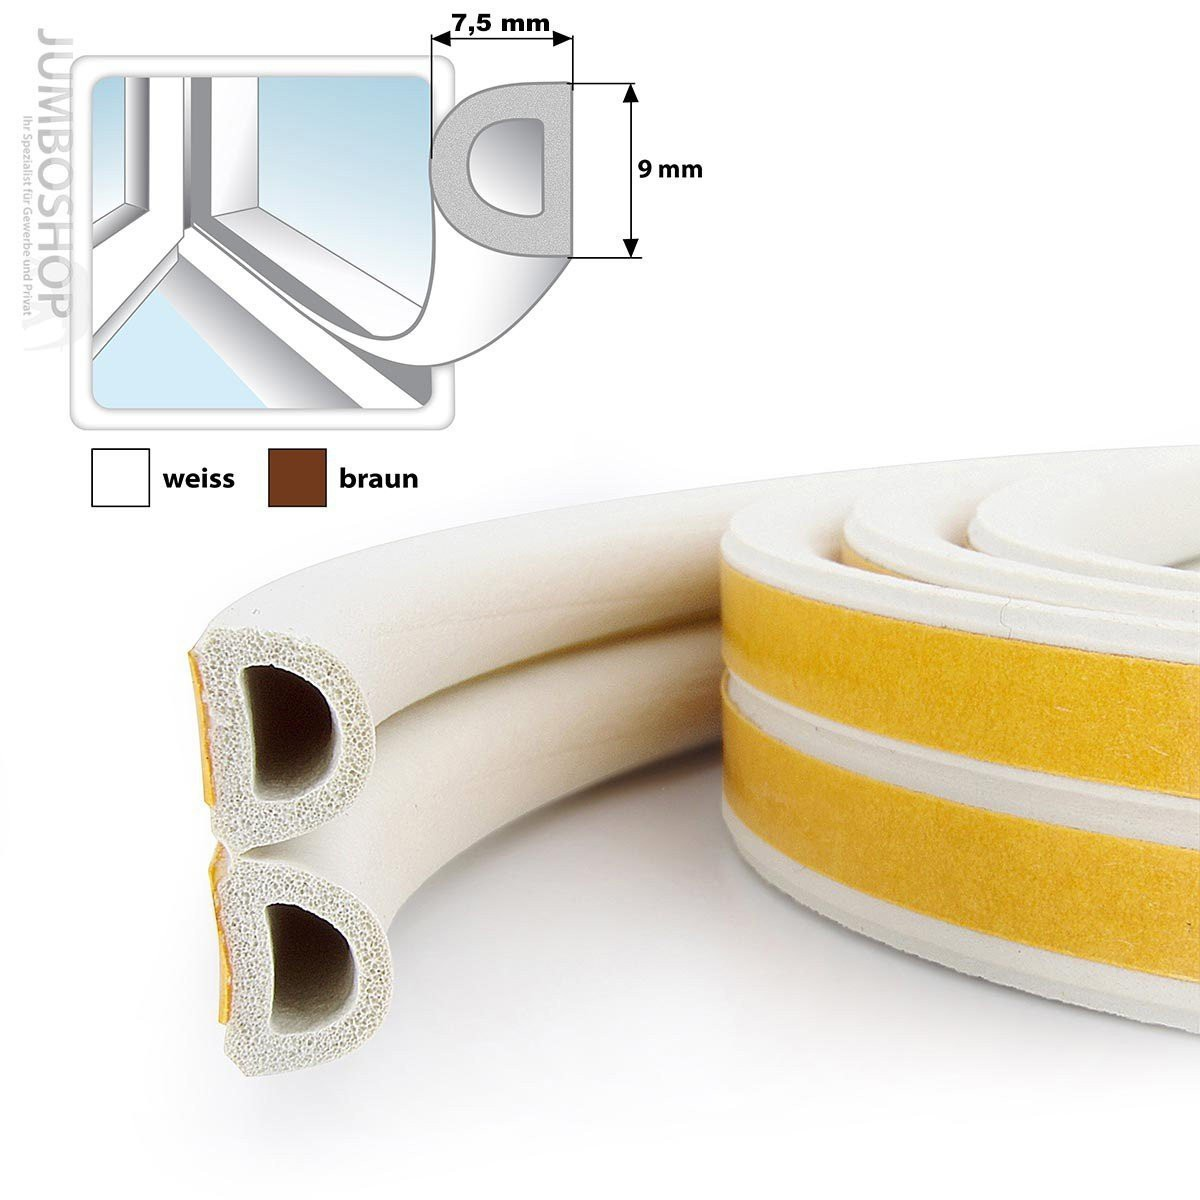 fensterdichtung gummidichtung d profil fenster dichtung. Black Bedroom Furniture Sets. Home Design Ideas